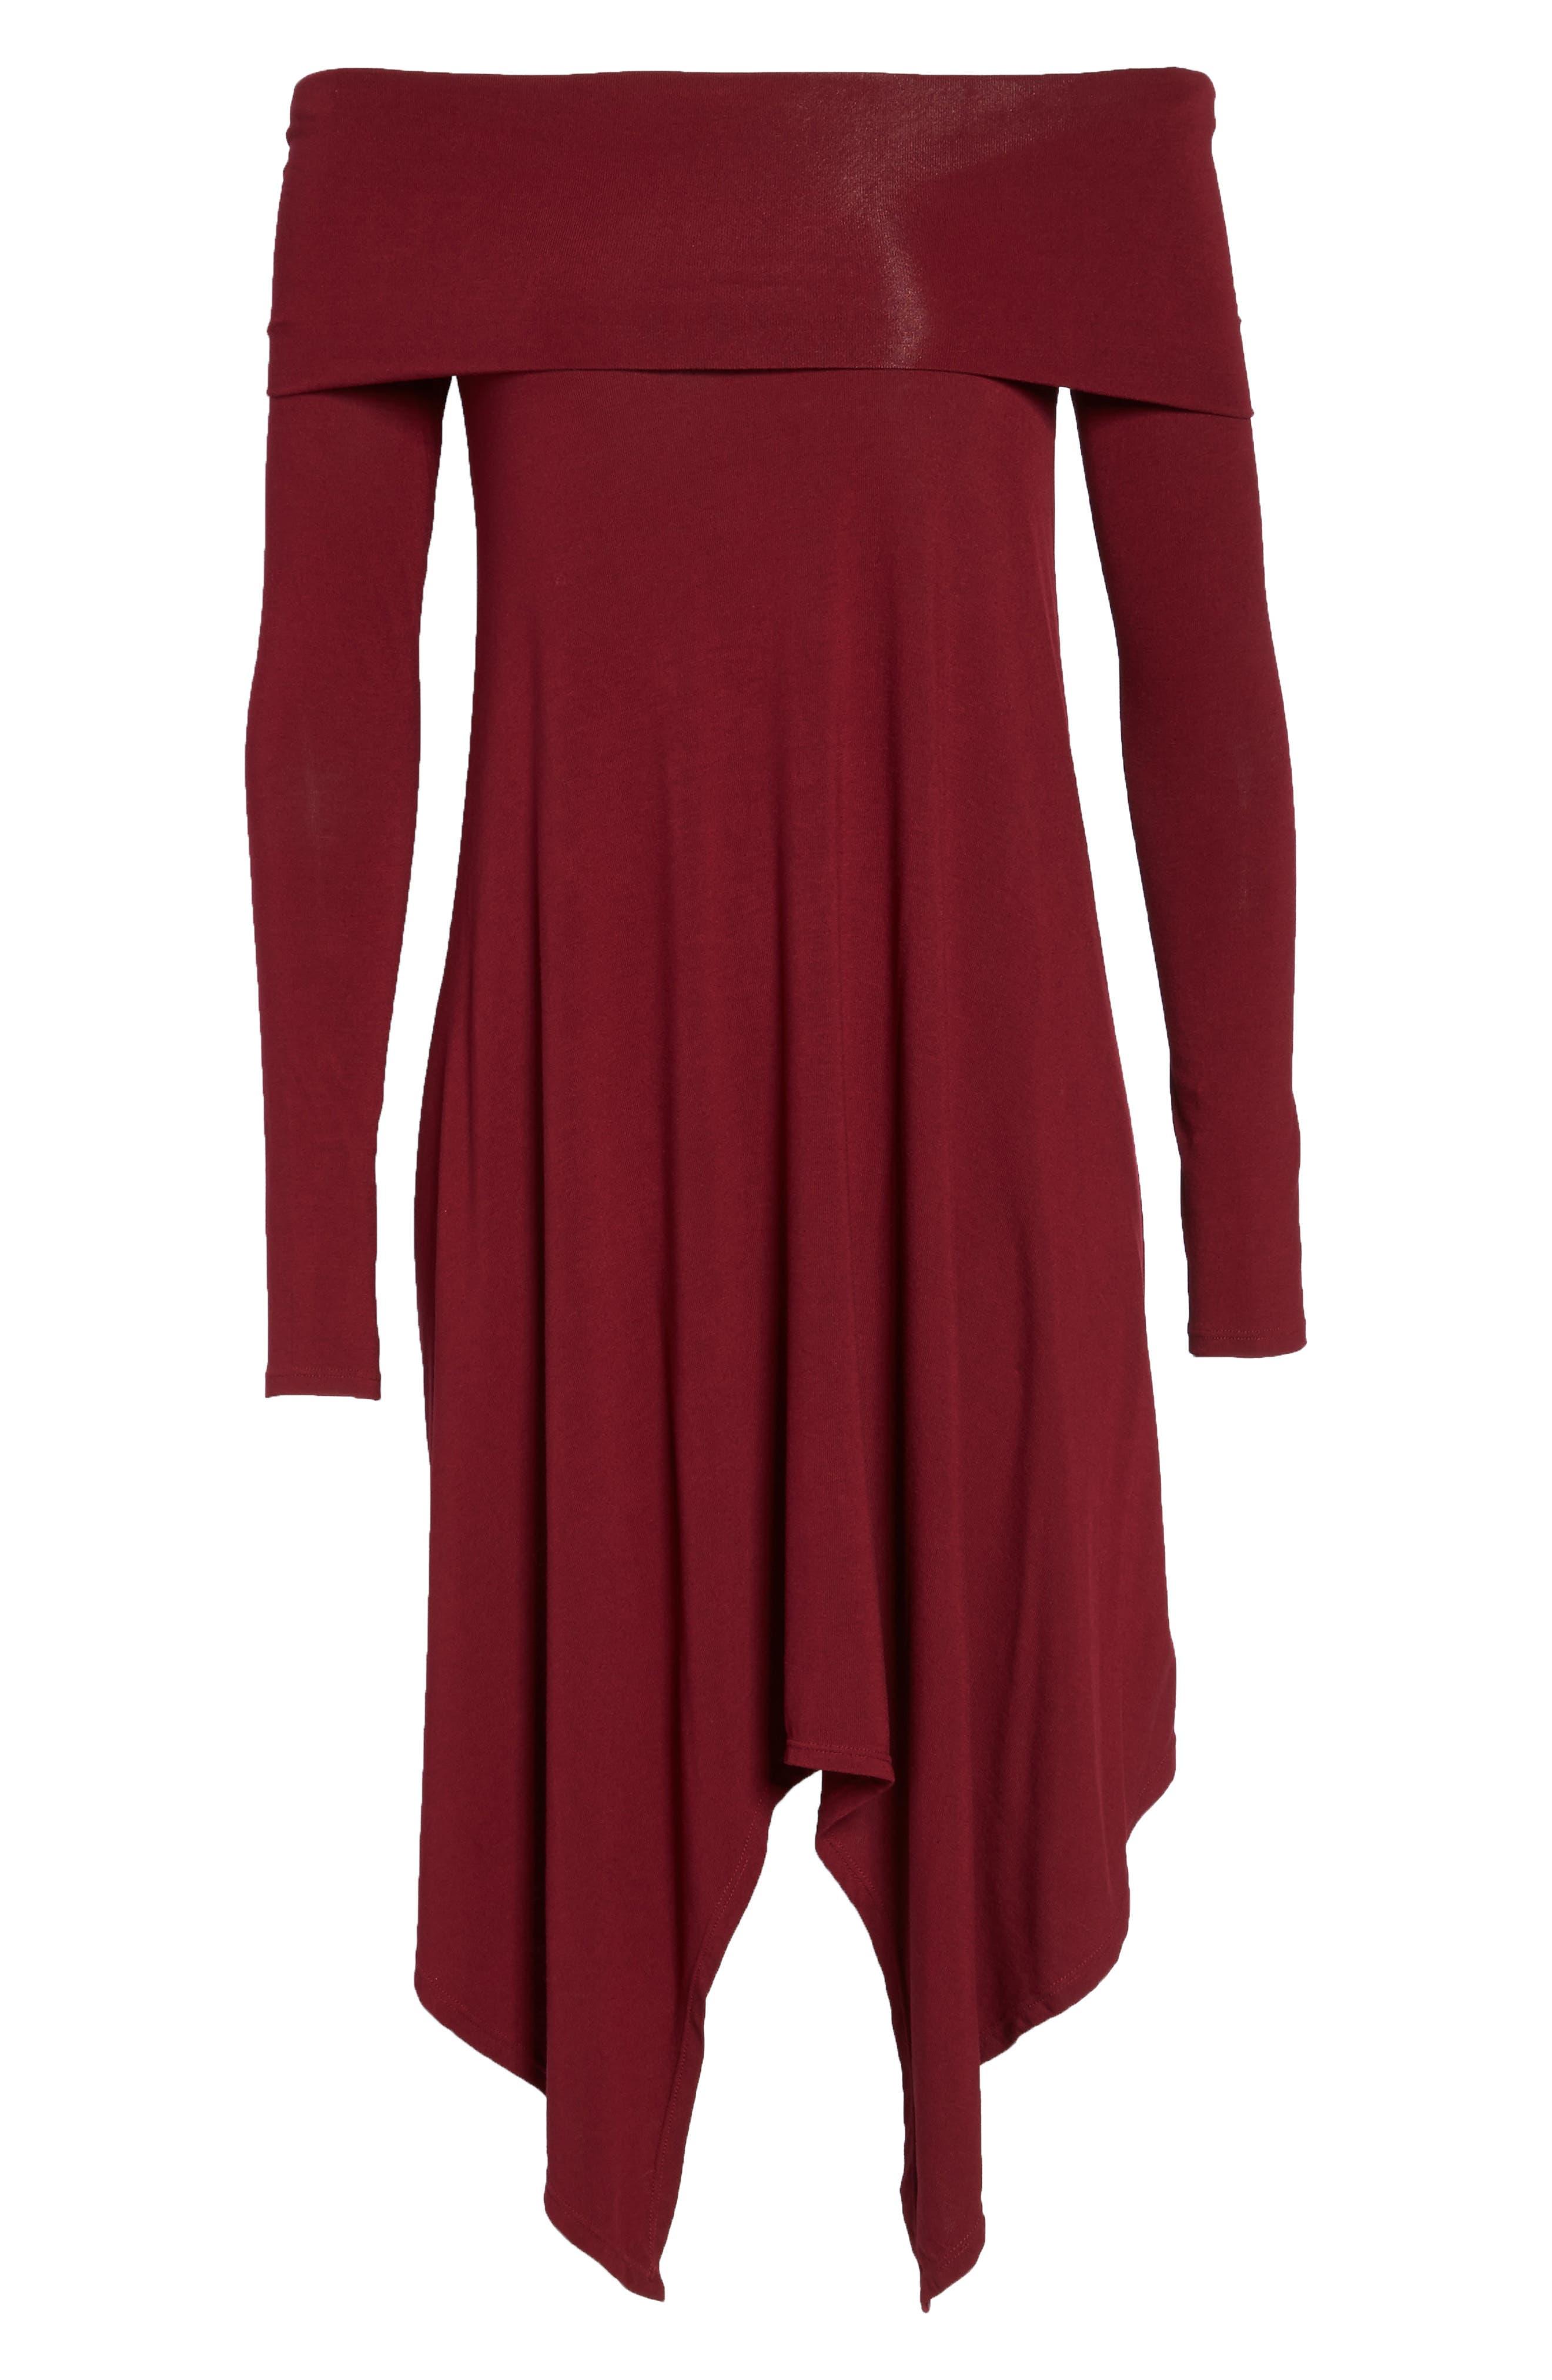 Off the Shoulder Knit A-Line Dress,                             Alternate thumbnail 6, color,                             600